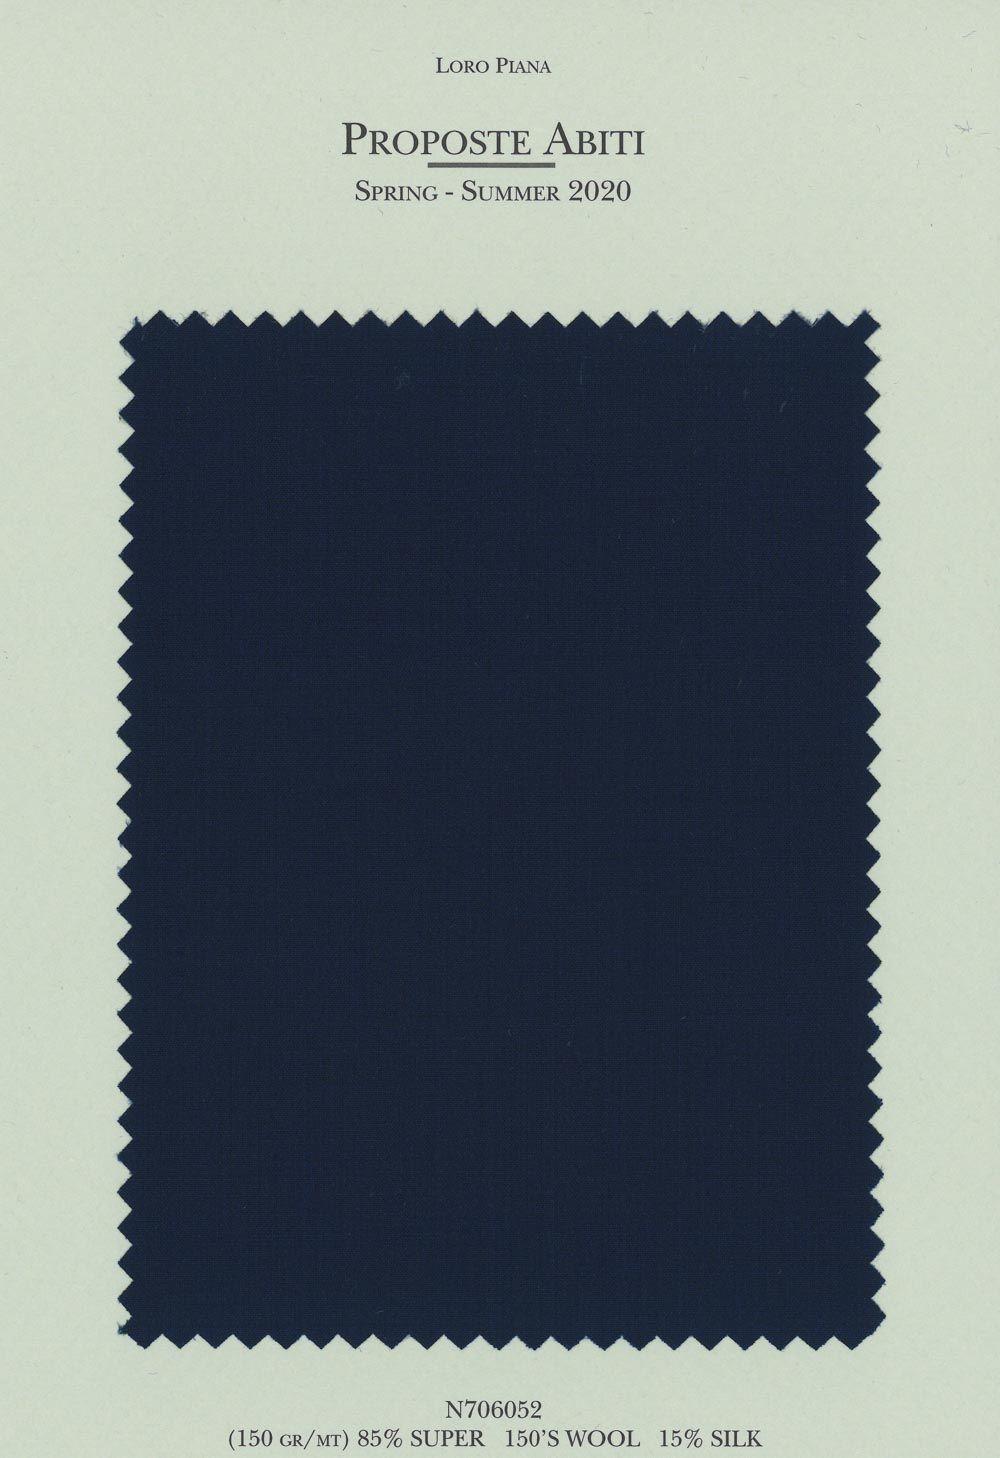 Lpn706052